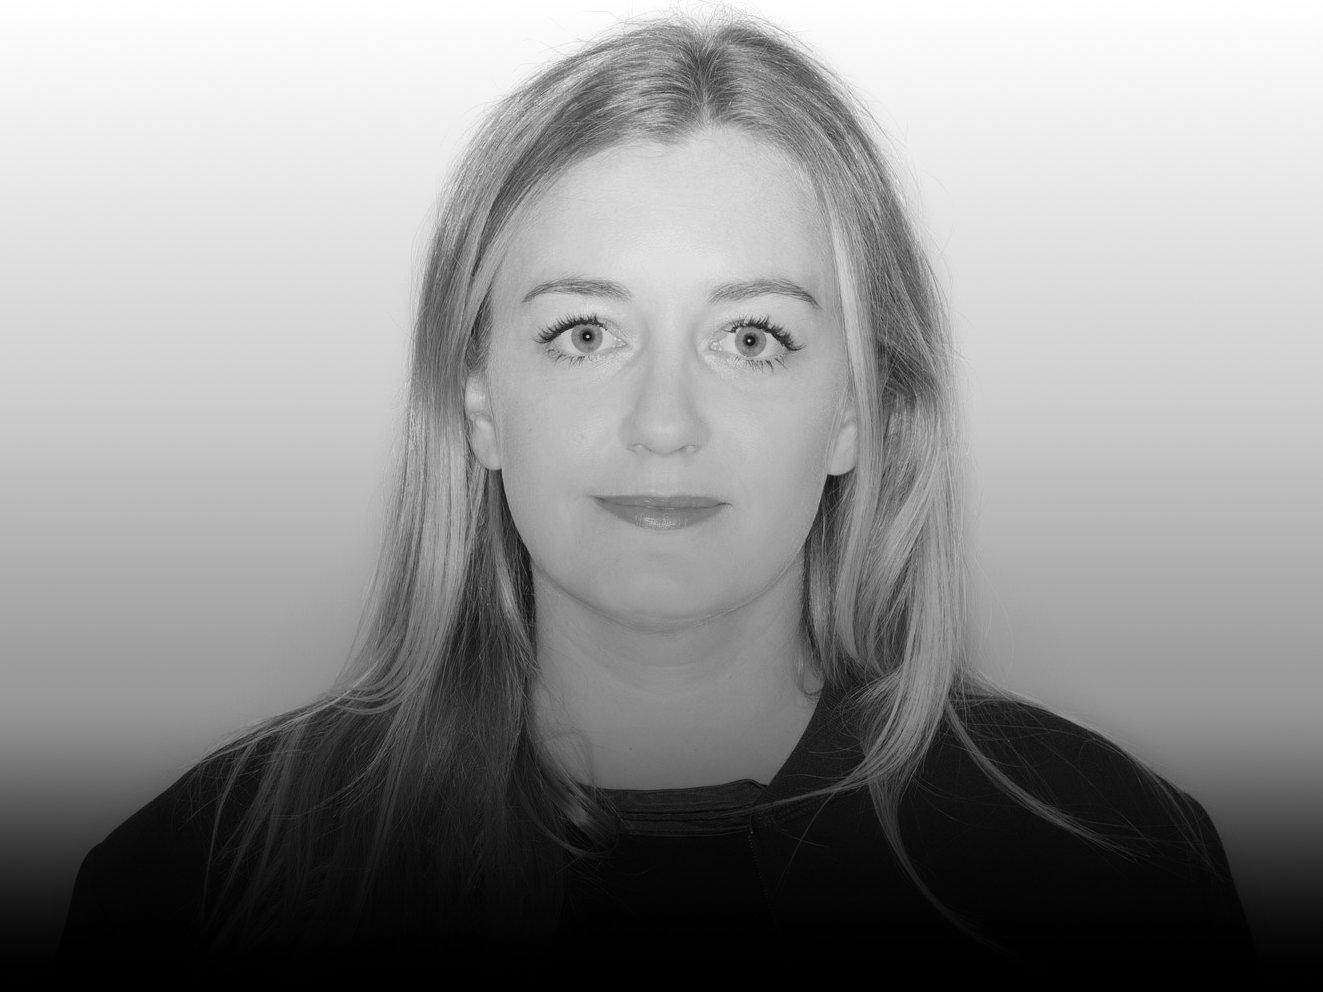 Image of Julia Neumann